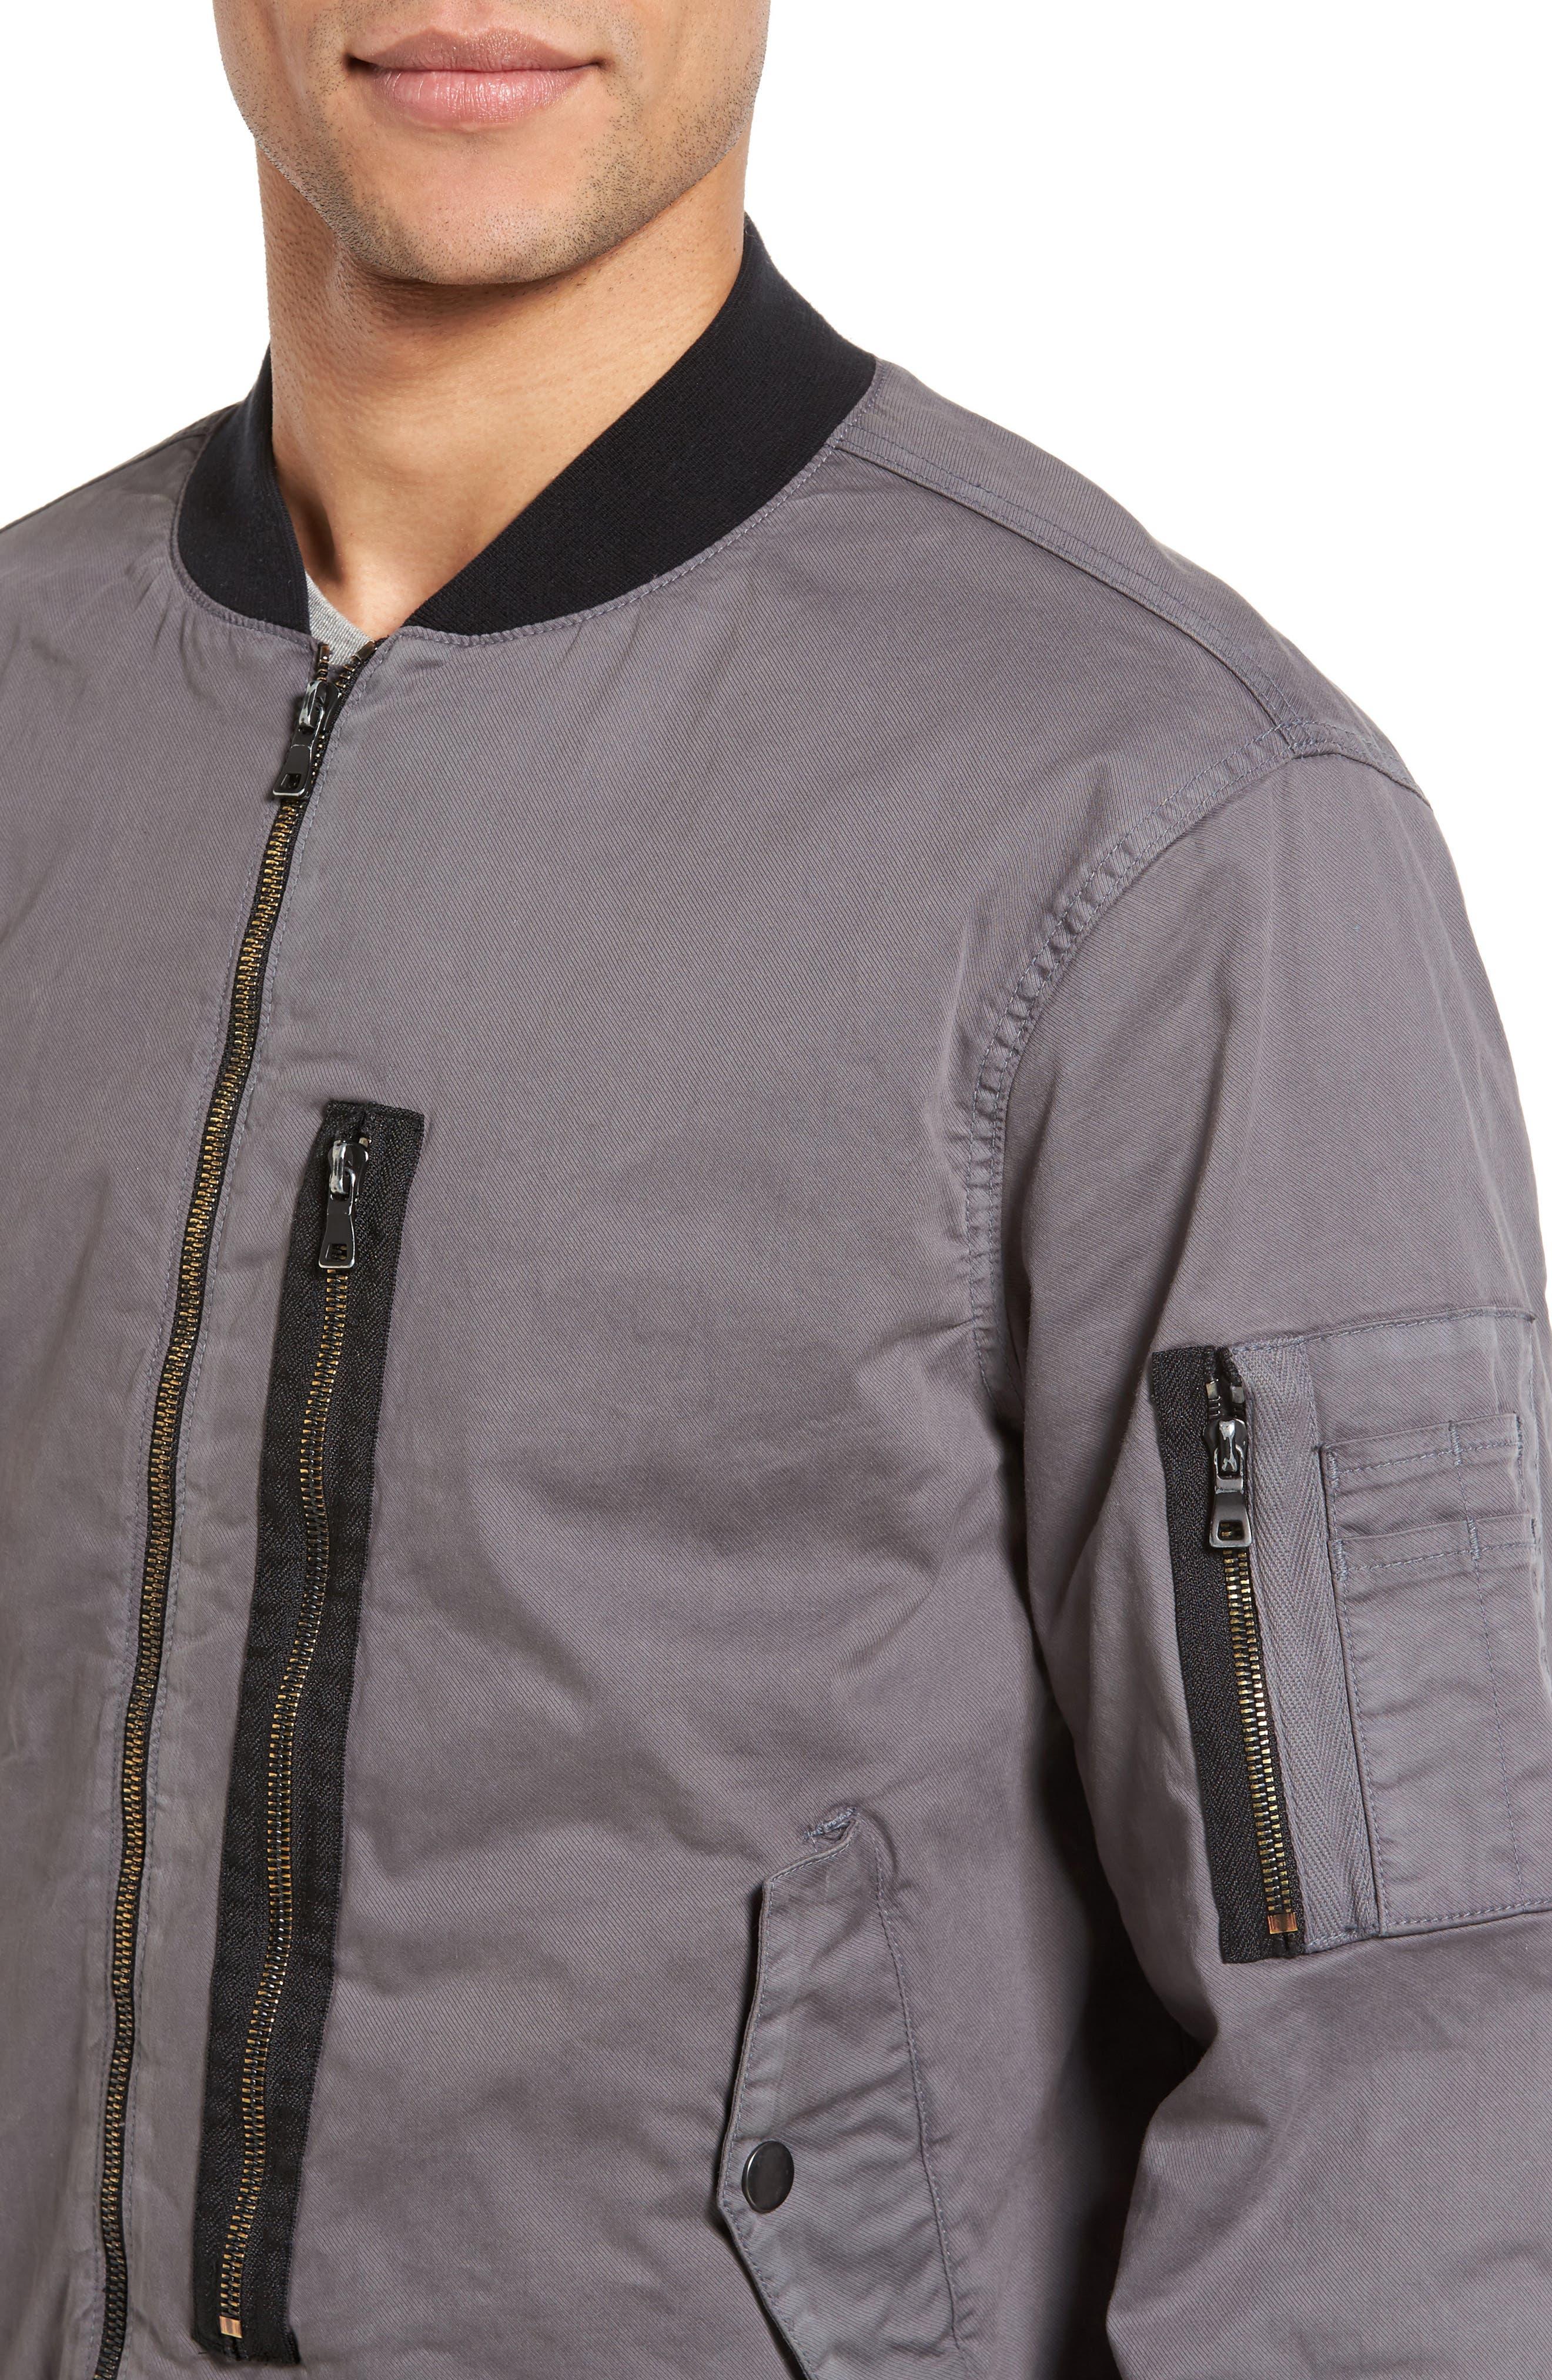 Knox Twill Bomber Jacket,                             Alternate thumbnail 4, color,                             020